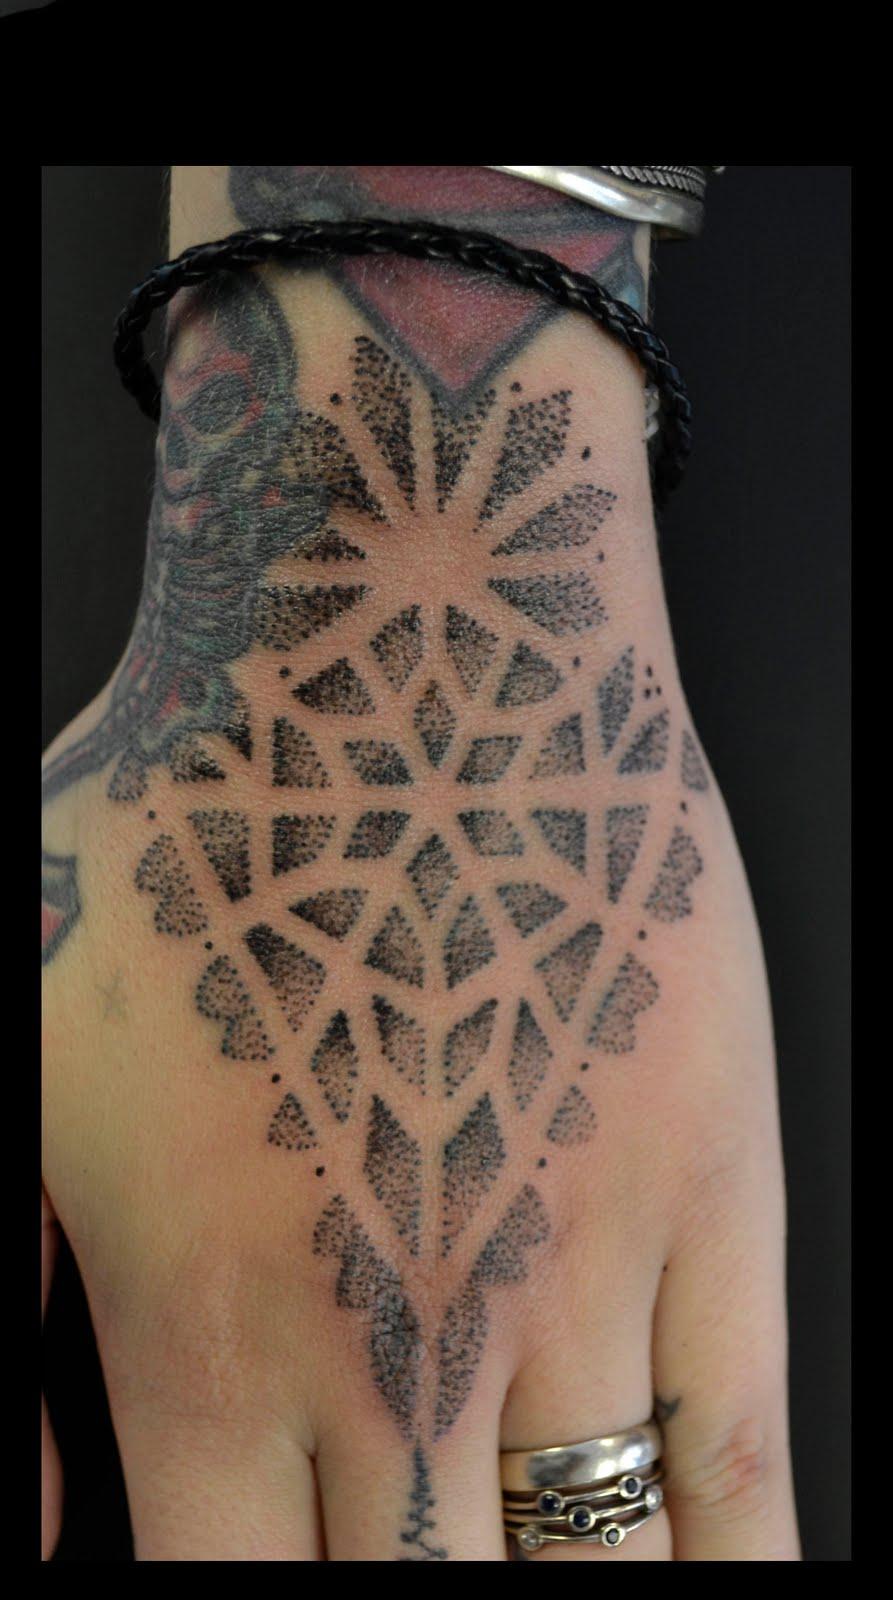 Dotwork Tattoo Images & Designs